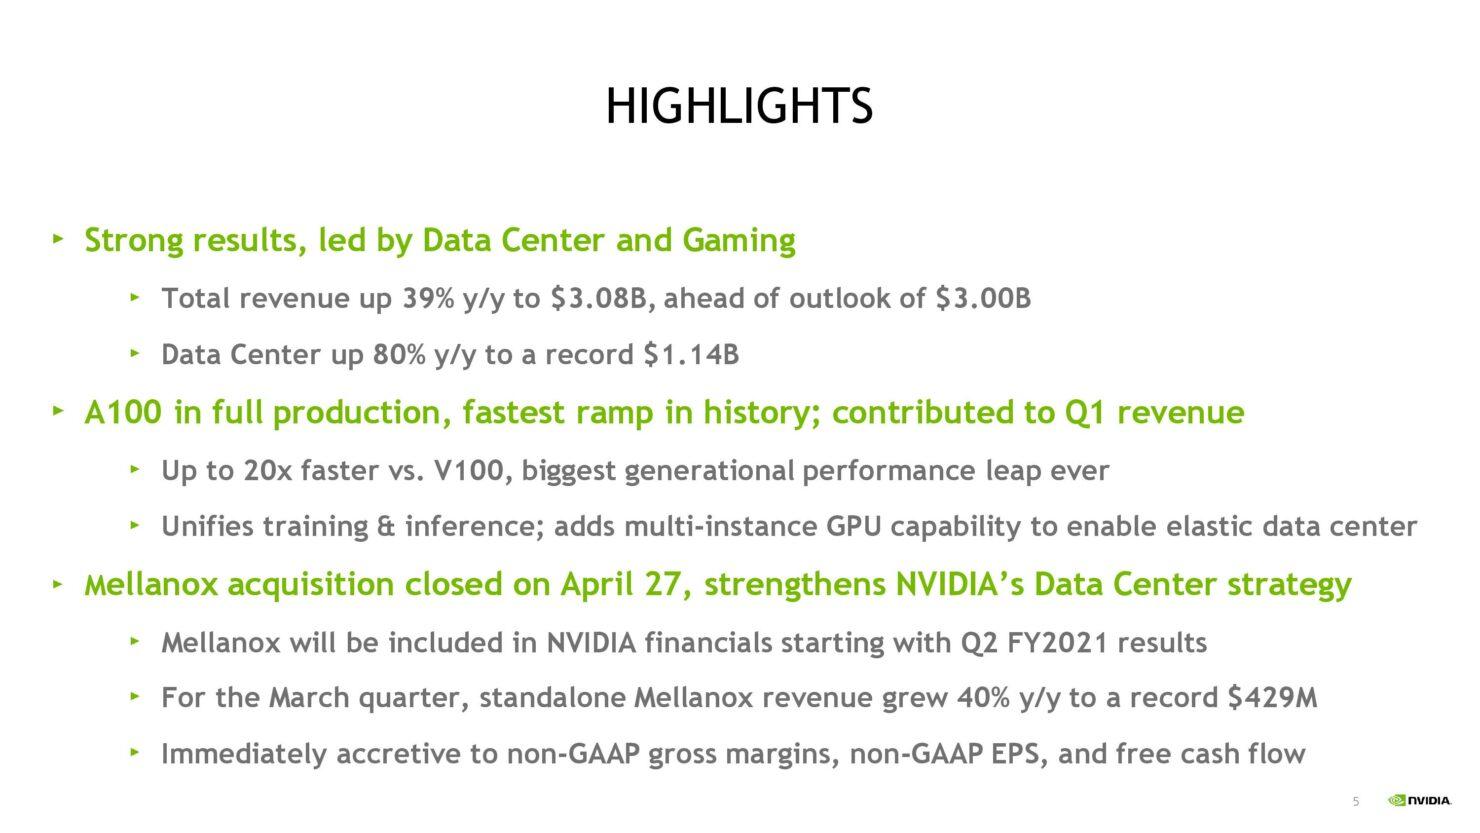 nvda-1qfy21-investor-presentation-5-21-20-final-page-005